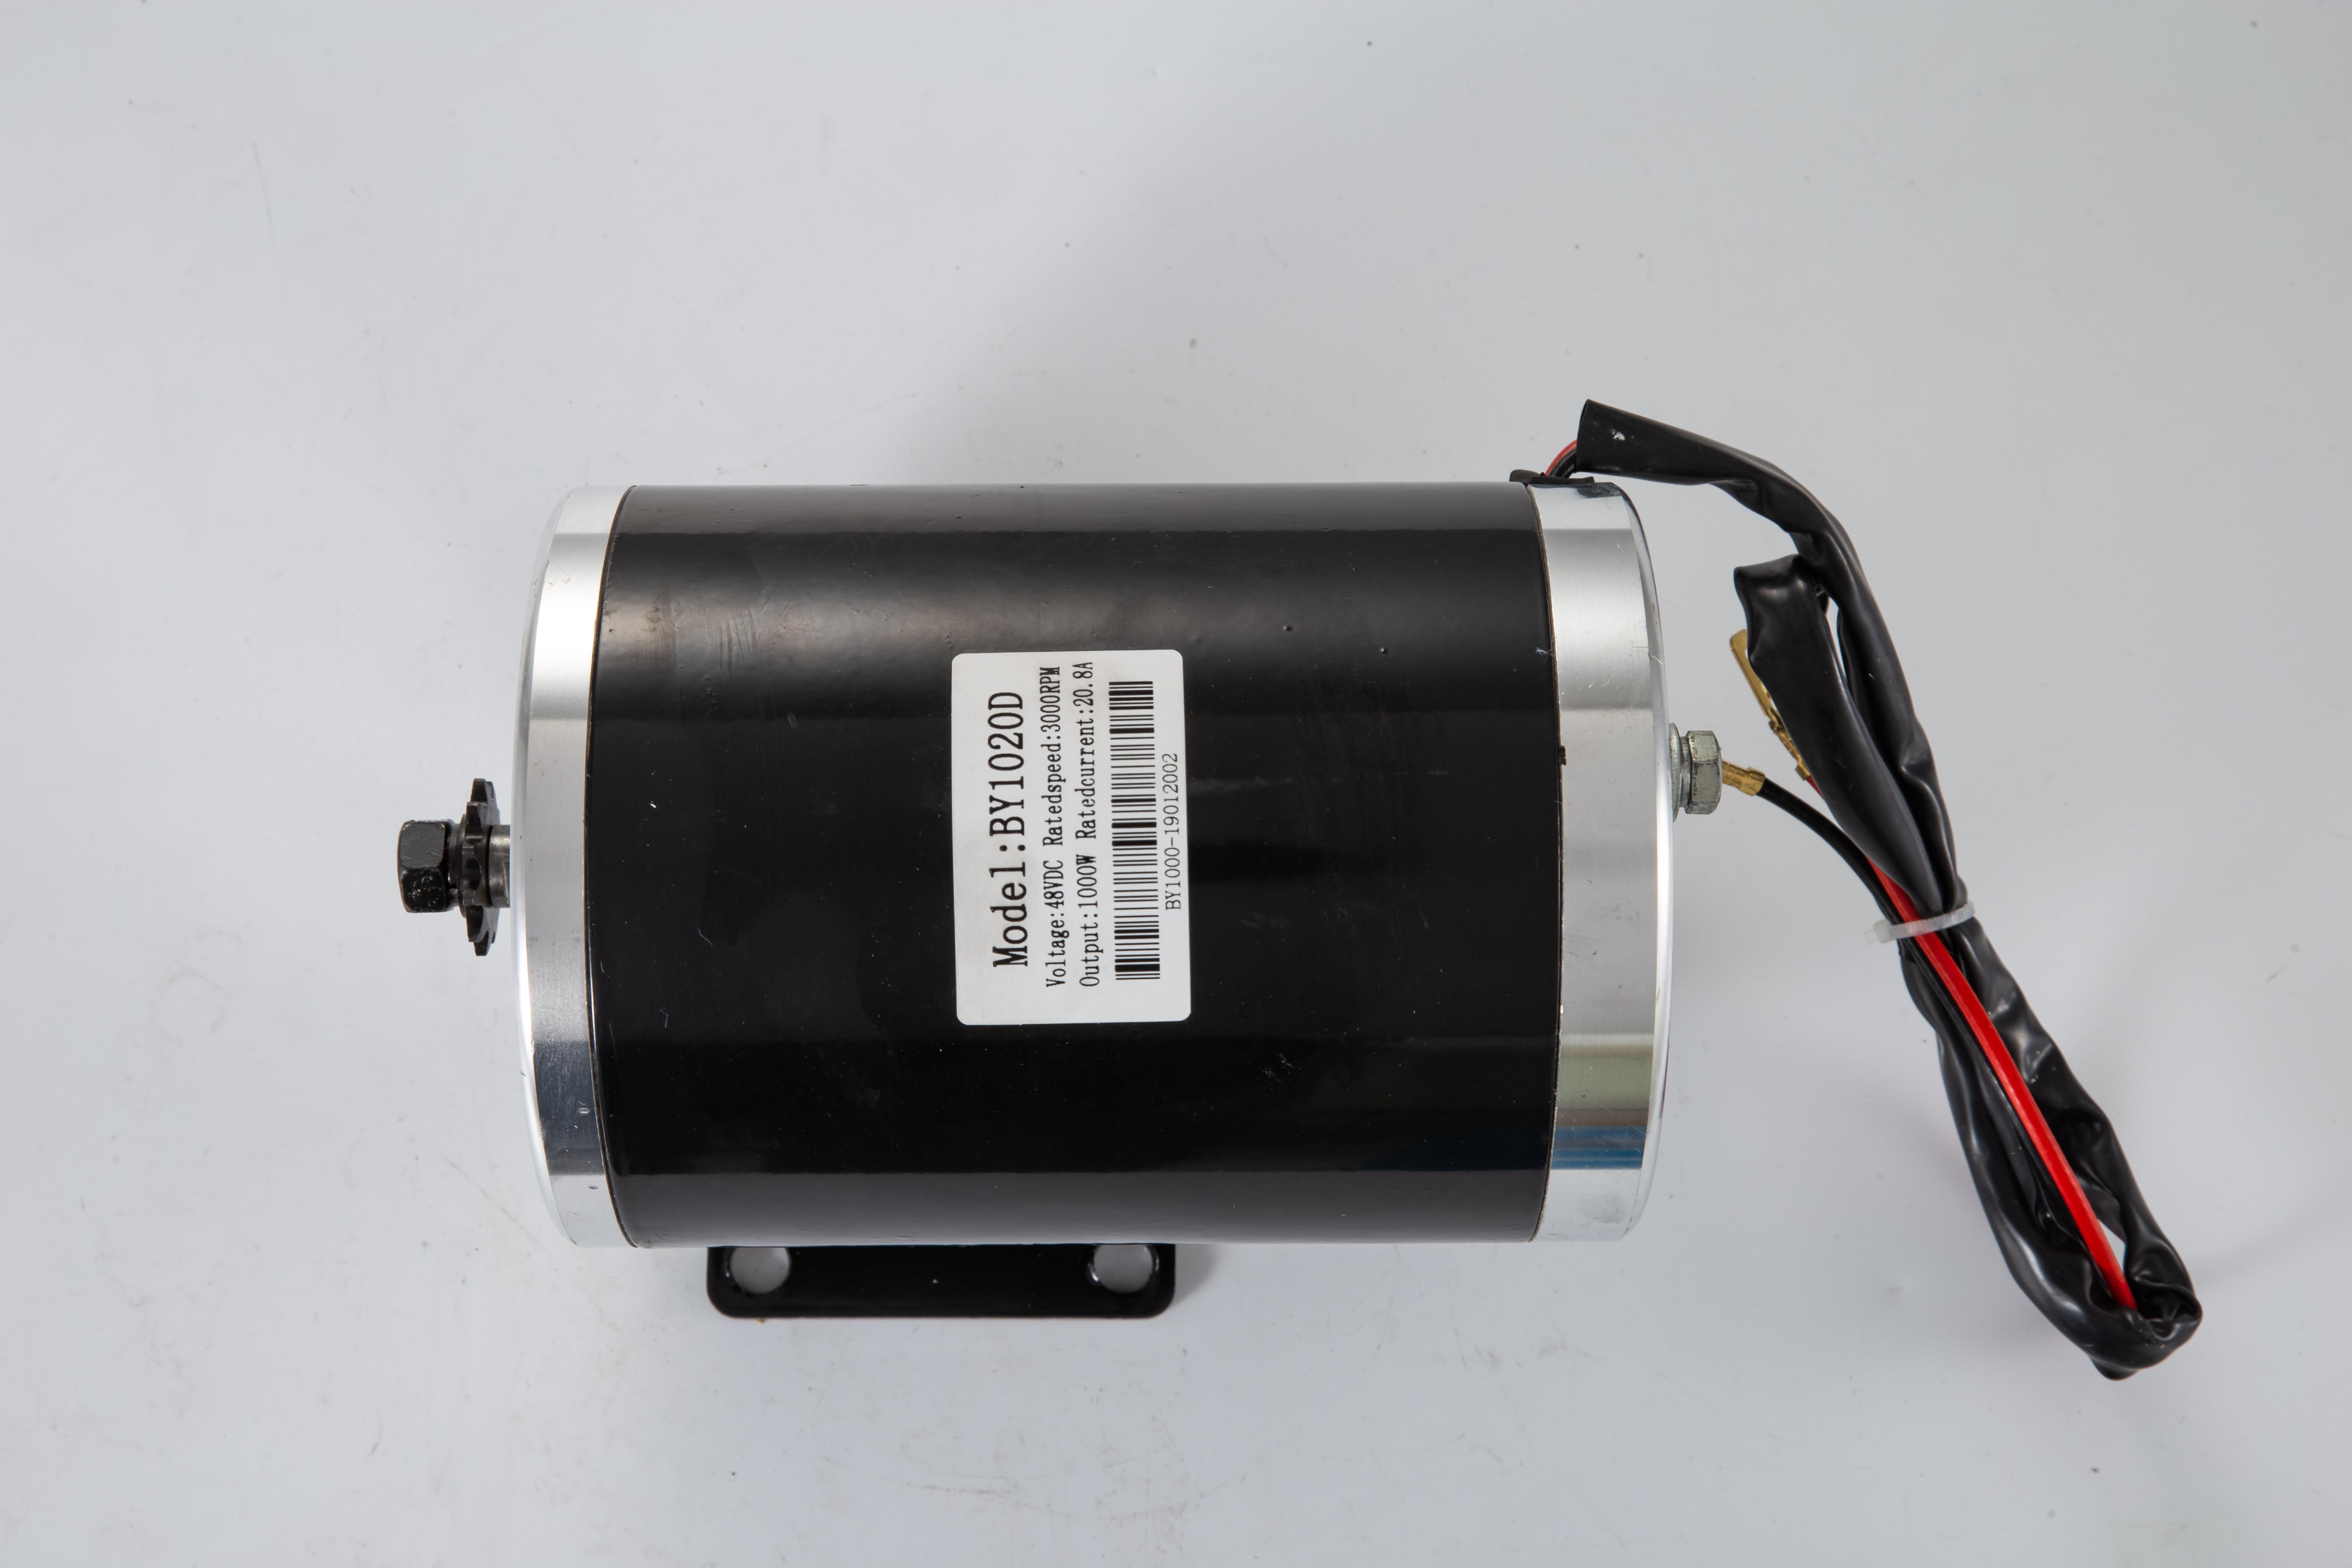 1800W-48V-DC-Brushless-Electric-Motor-Kit-f-Scooter-500-1800W-E-Bike-Go-Kart thumbnail 105